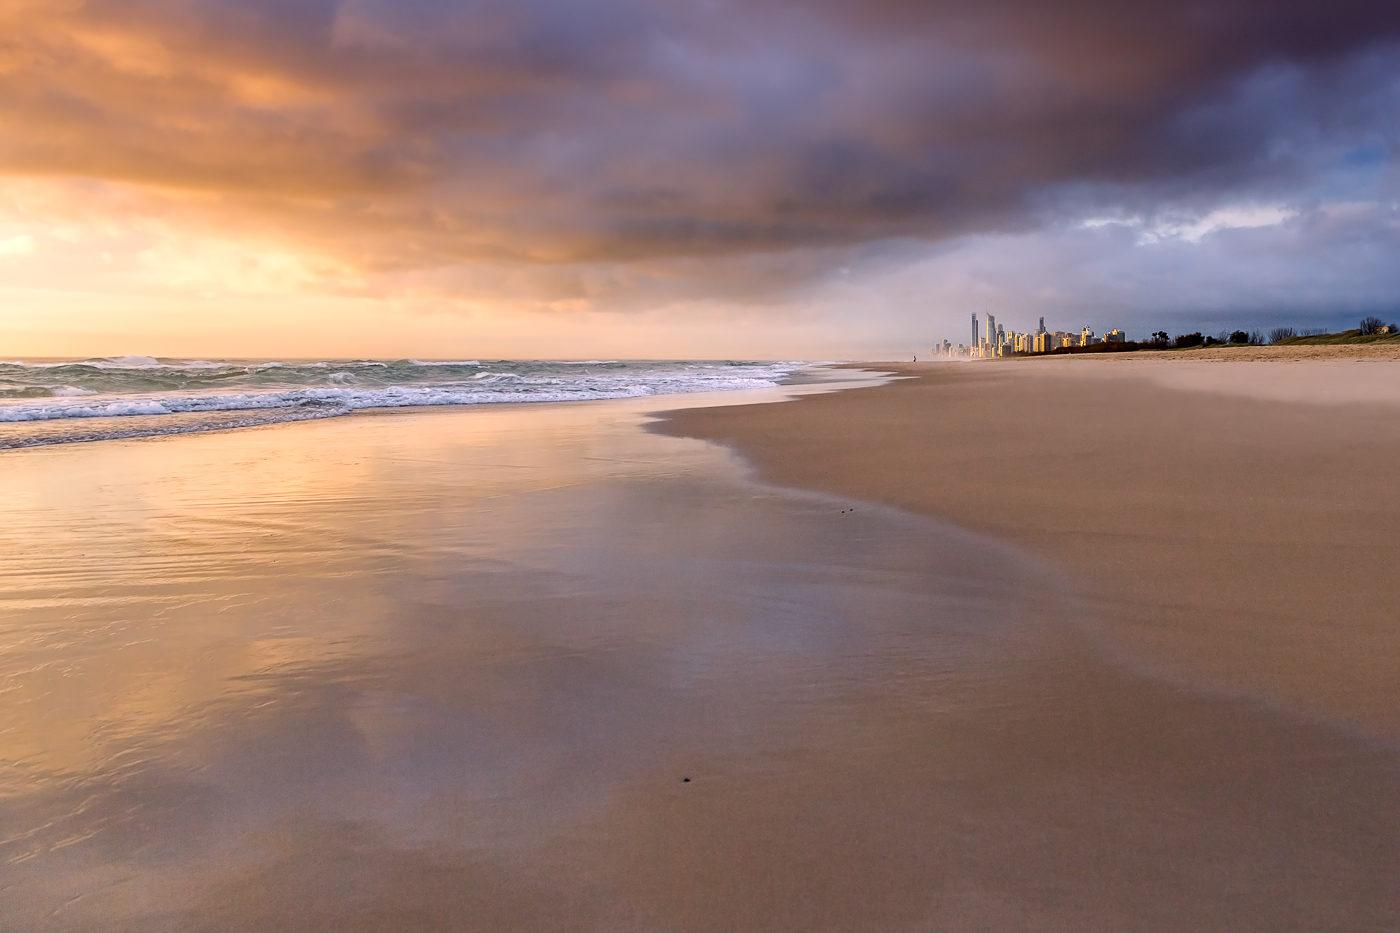 Surf City by Kathlyn Tedder (AB Grade) - MERIT